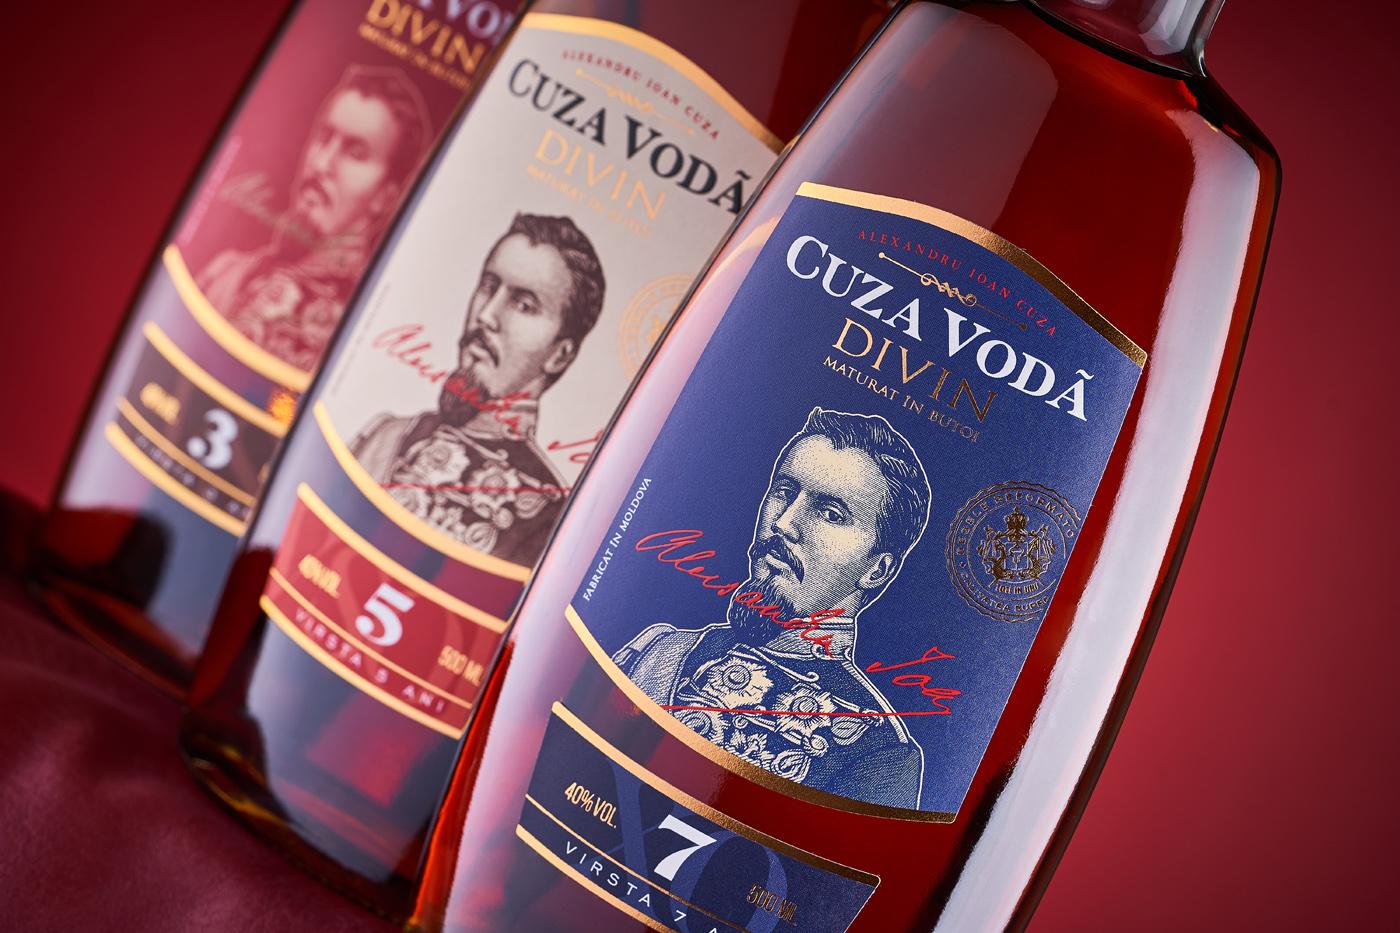 43oz Design Studio Redesign Brandy Label for Cuza Voda